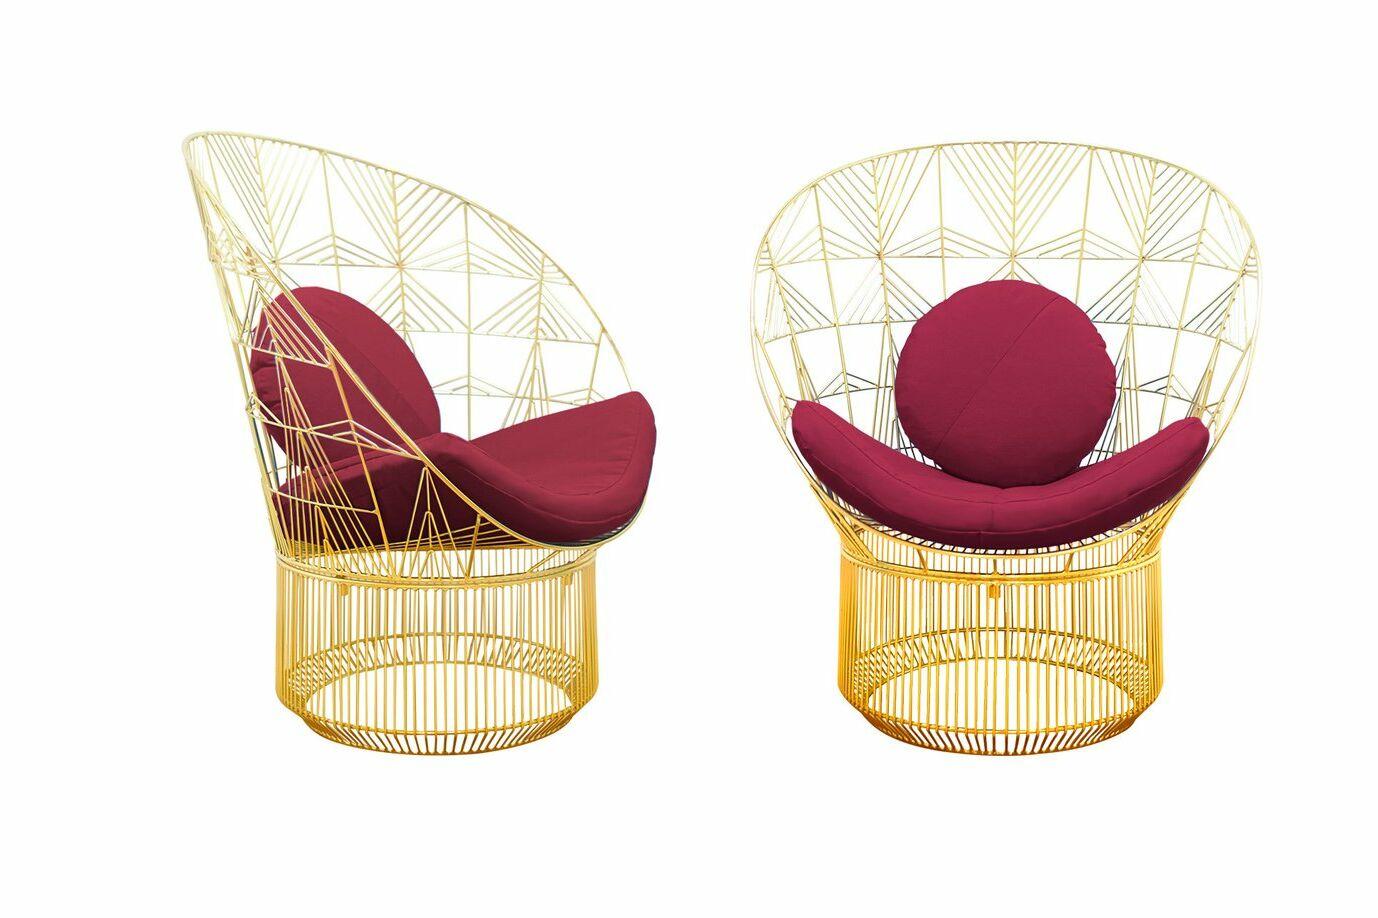 Peacock Sunbrella Lounge Chair Cushion Fabric: Burgundy